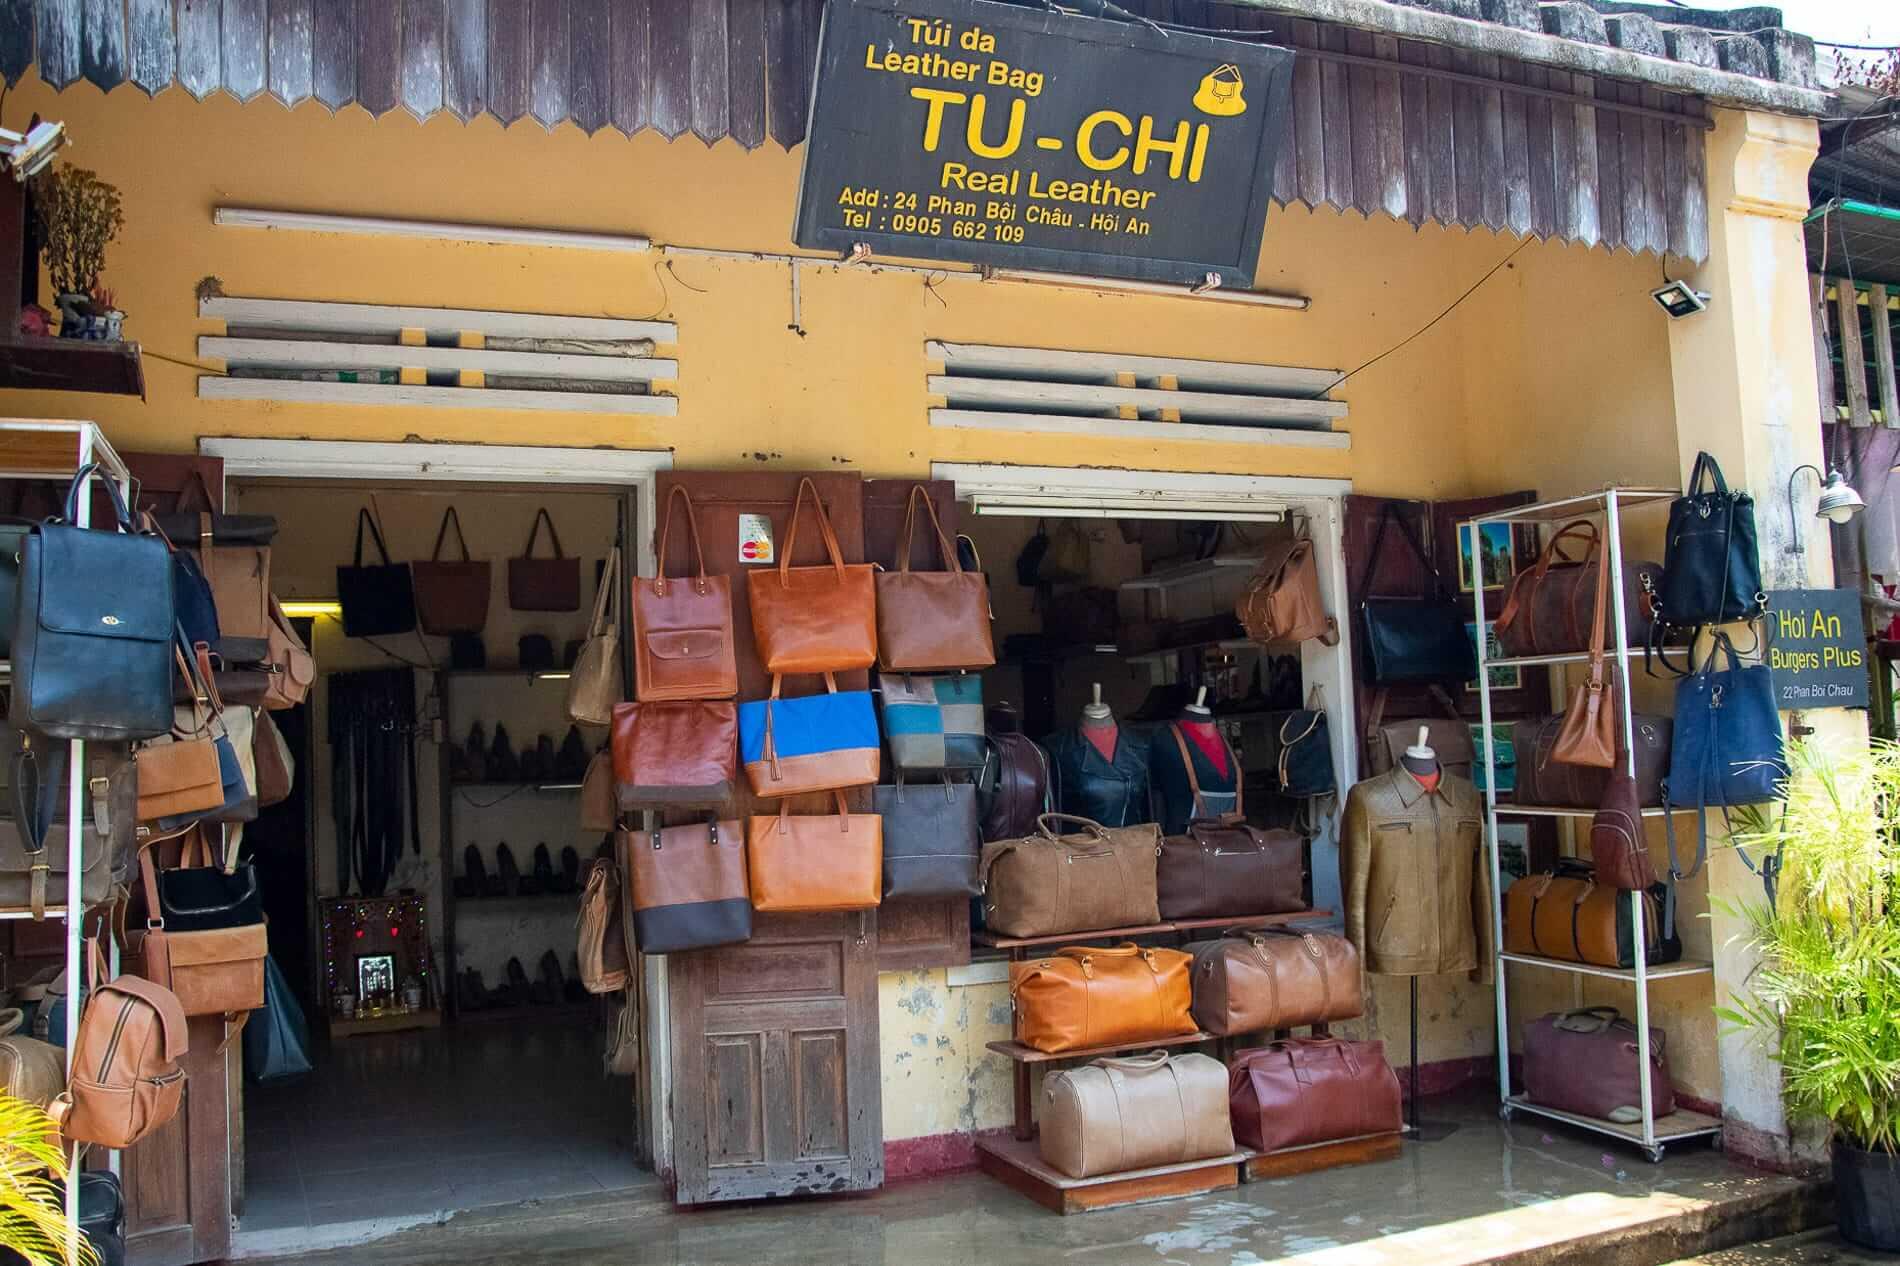 Tu Chi Hana - Leather shops